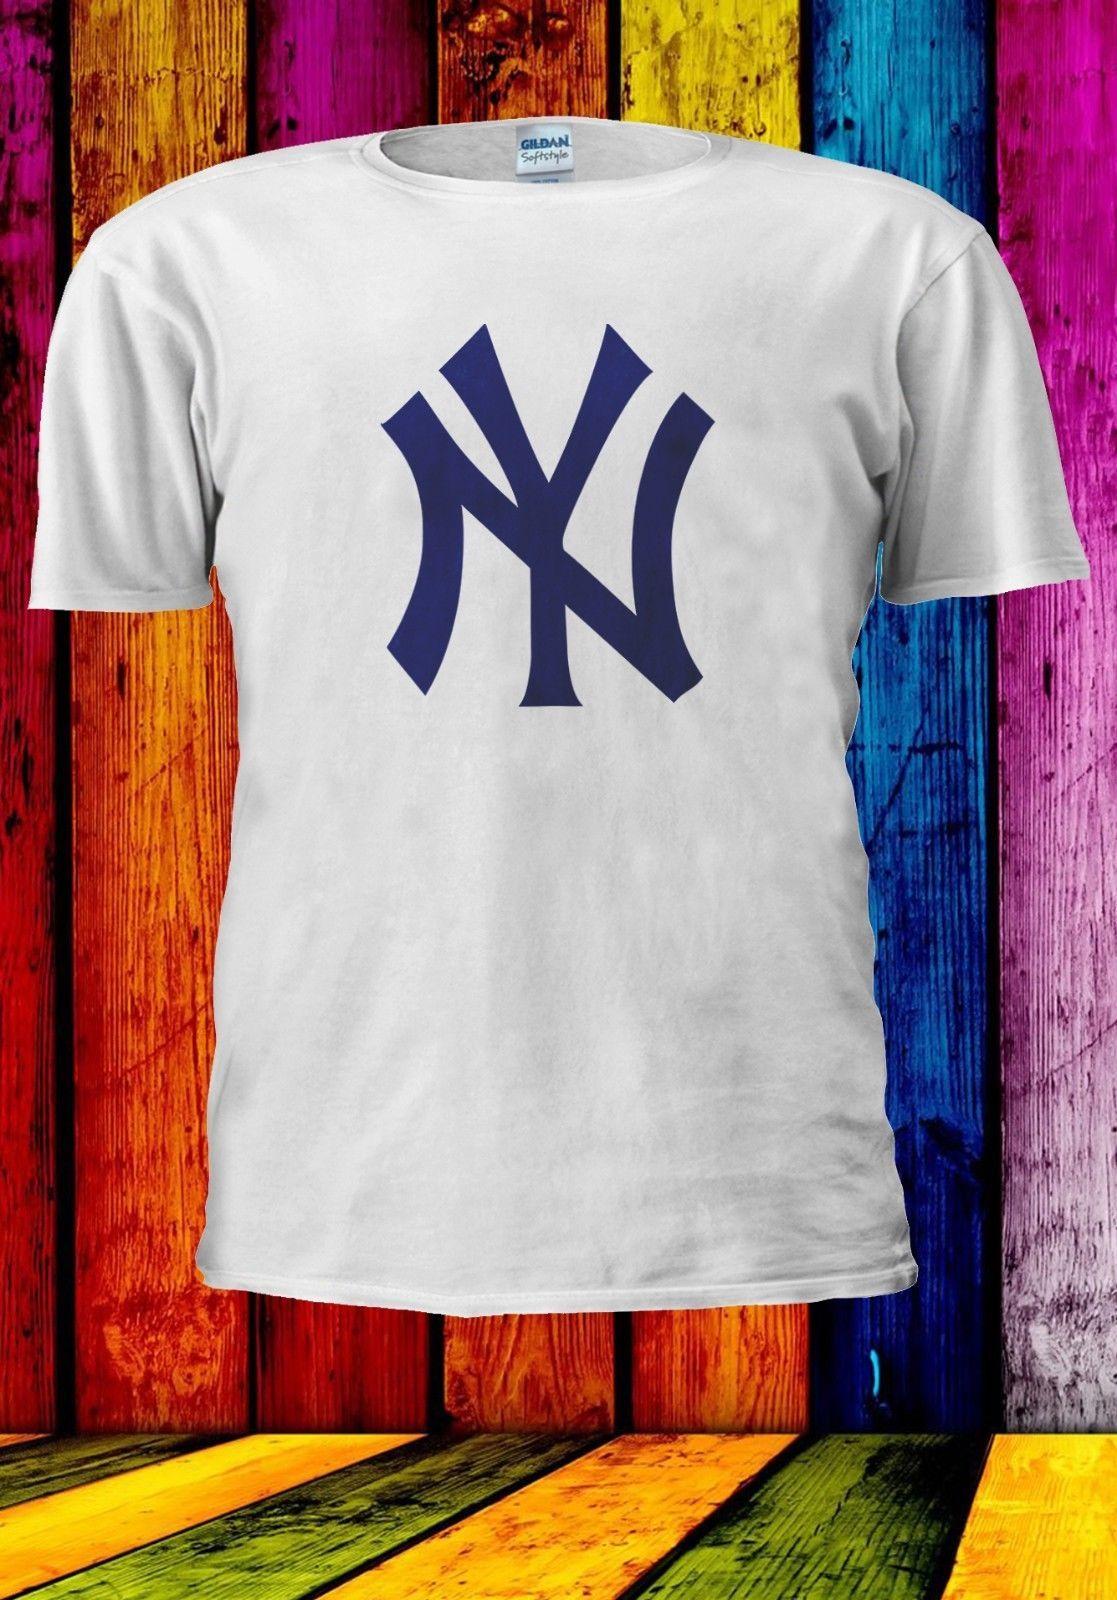 32b4c822f NY NEW YORK YANKEES MLB BASEBALL TEAM LOGO Men Women Unisex T Shirt 965  Formal Shirts Denim Shirts From Shirtainly, $11.01  DHgate.Com